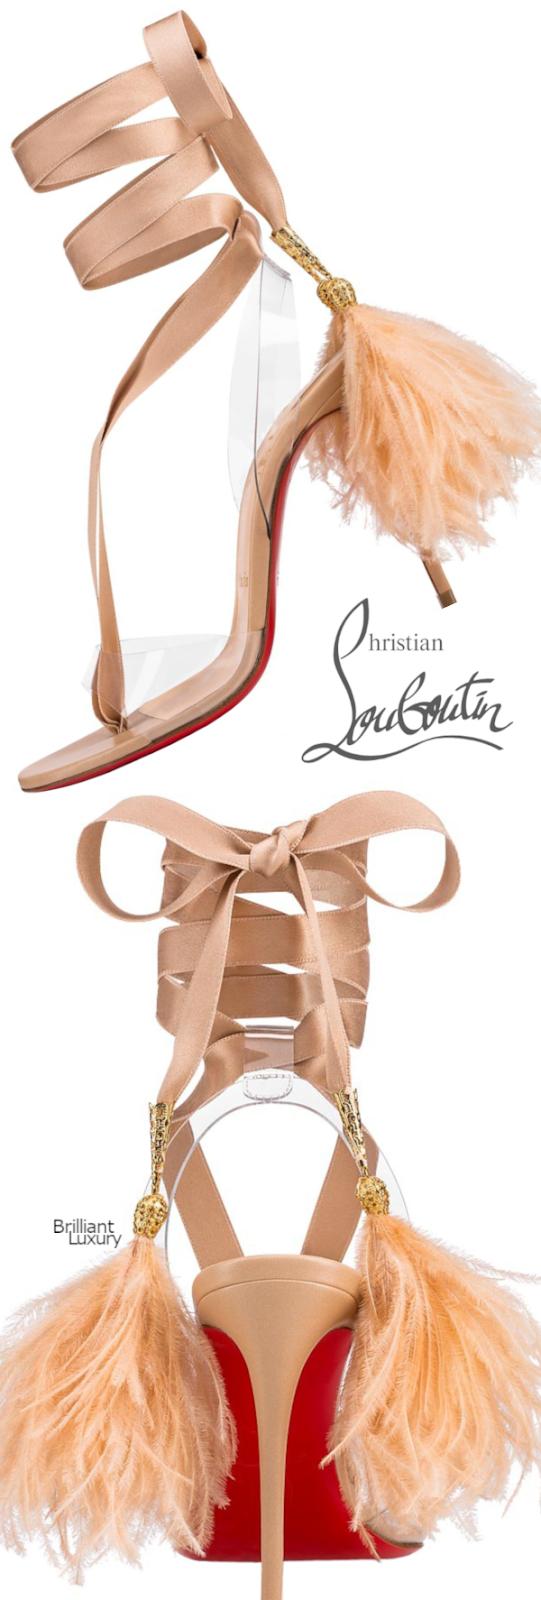 Brilliant Luxury♦Christian Louboutin Marie Edwina feathered open-toe sandals